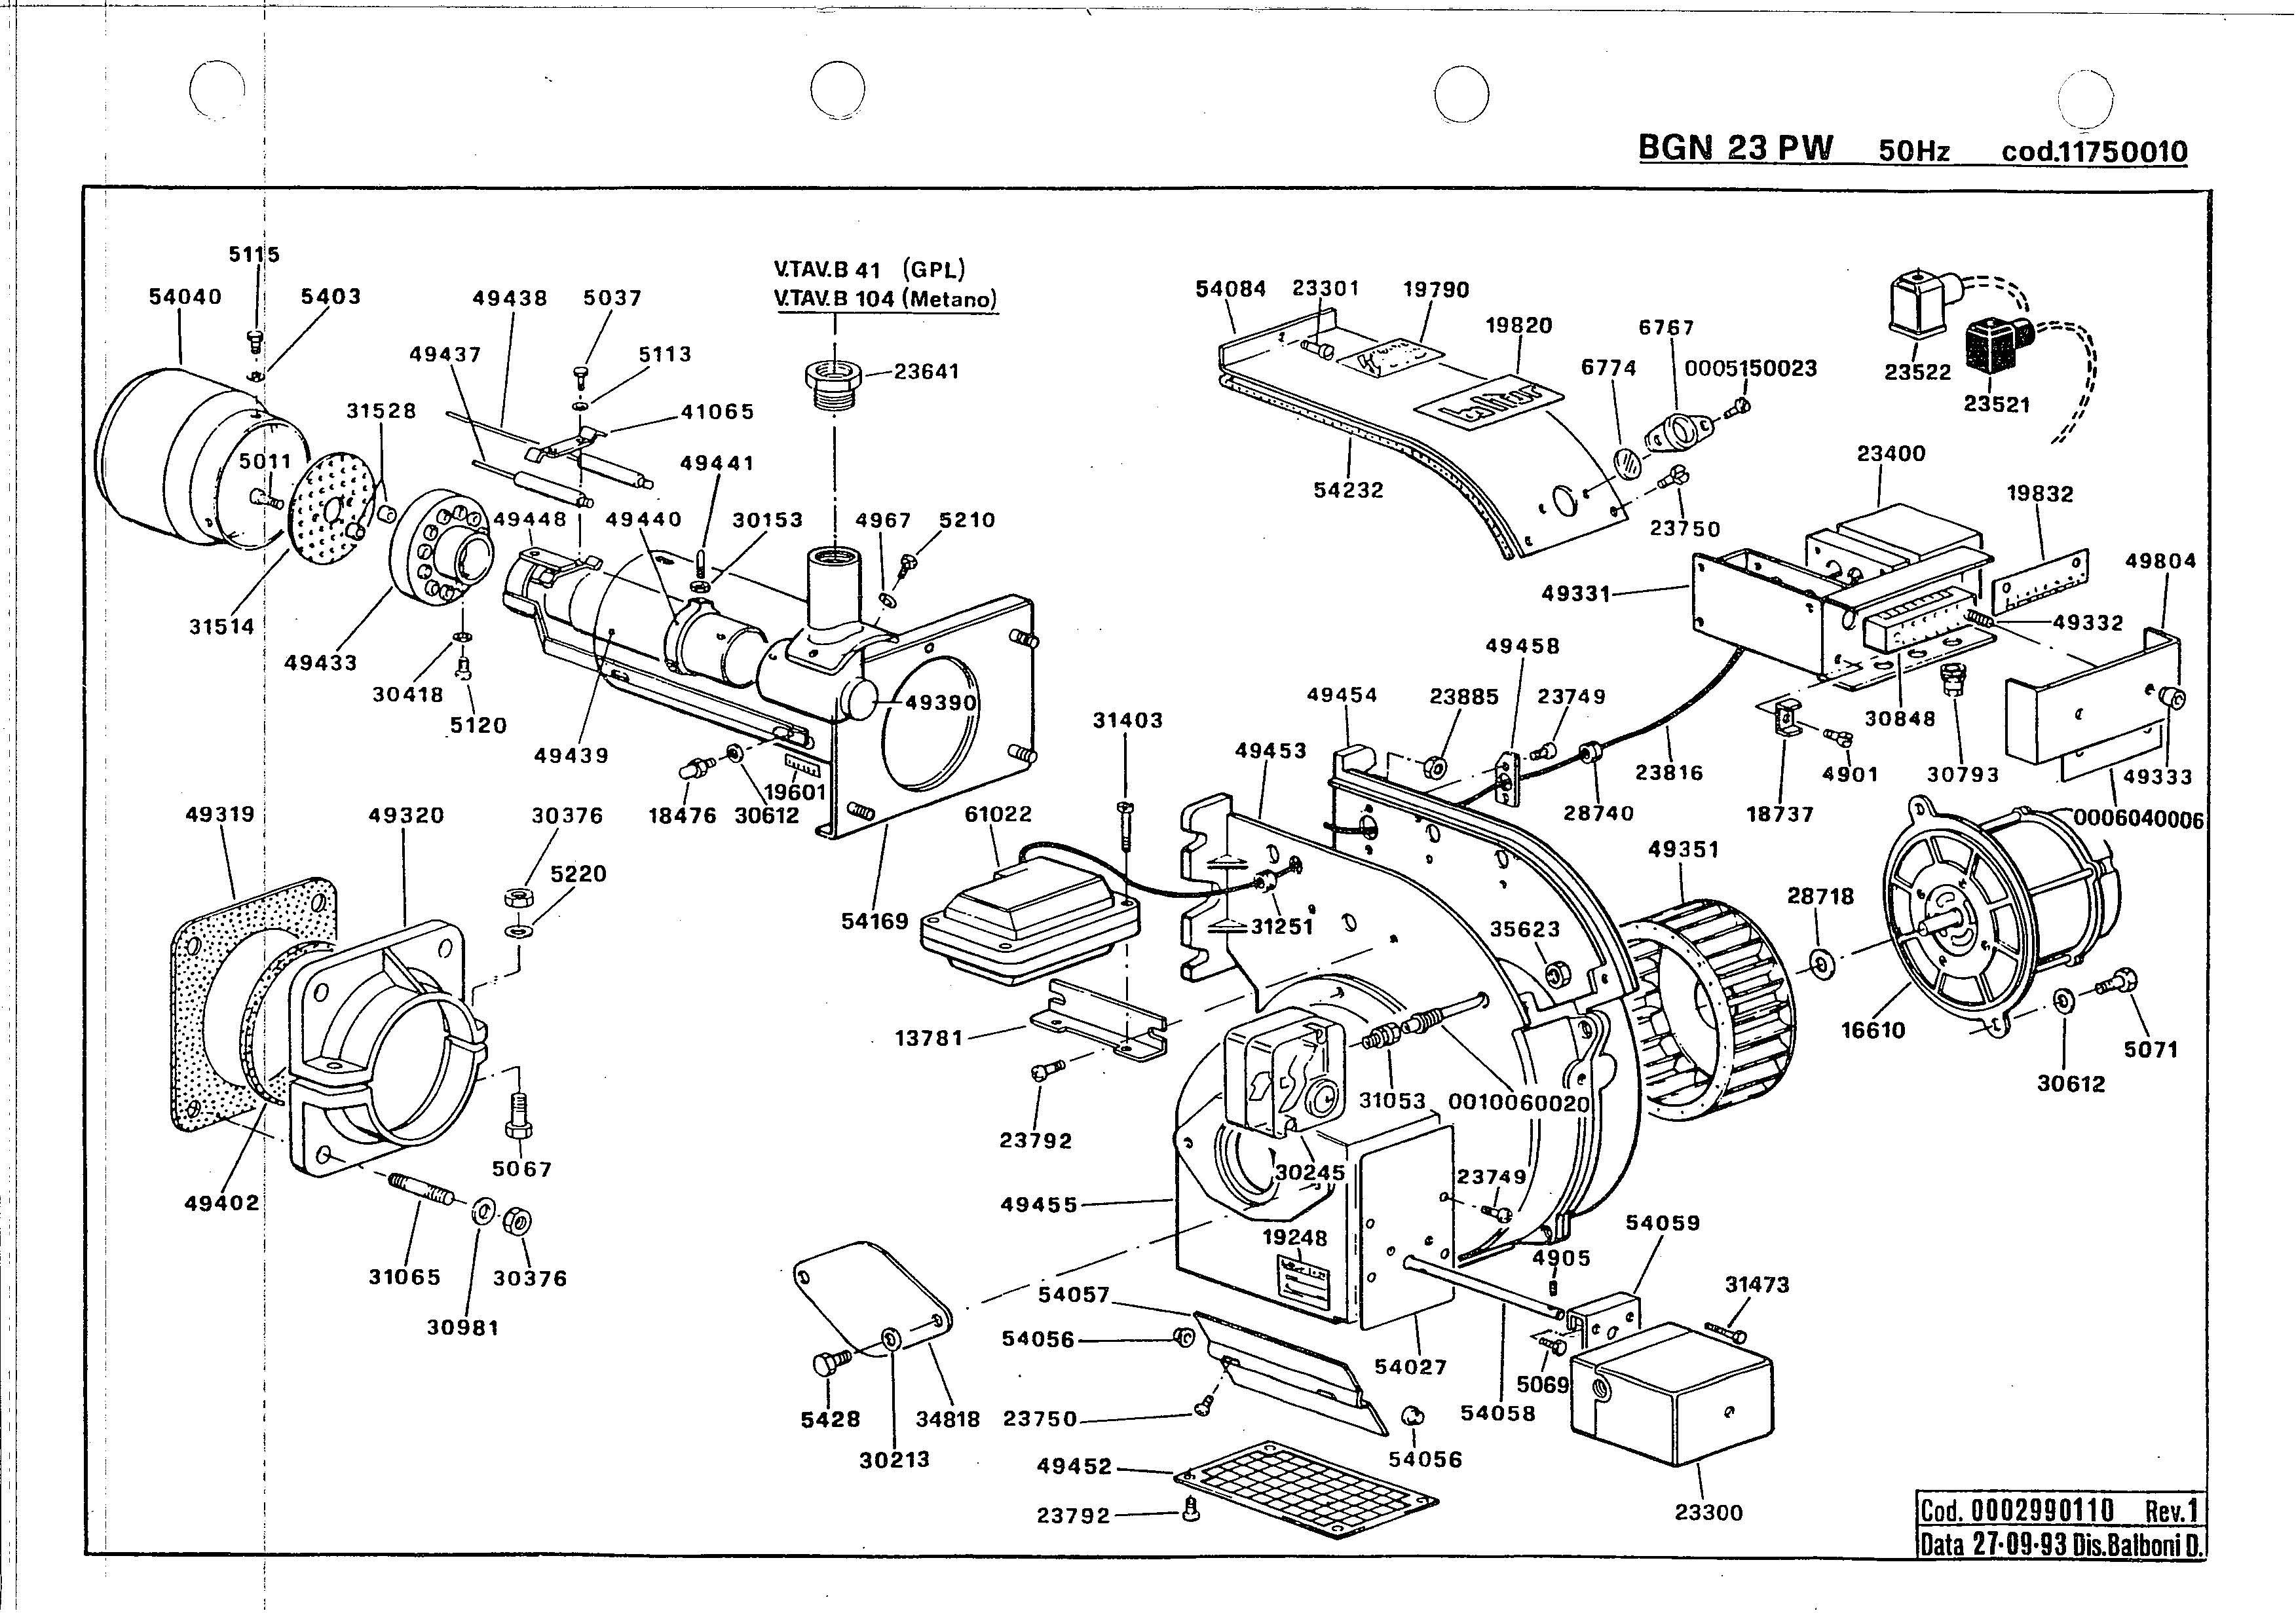 BGN 23 PW 11750010 1 19930927